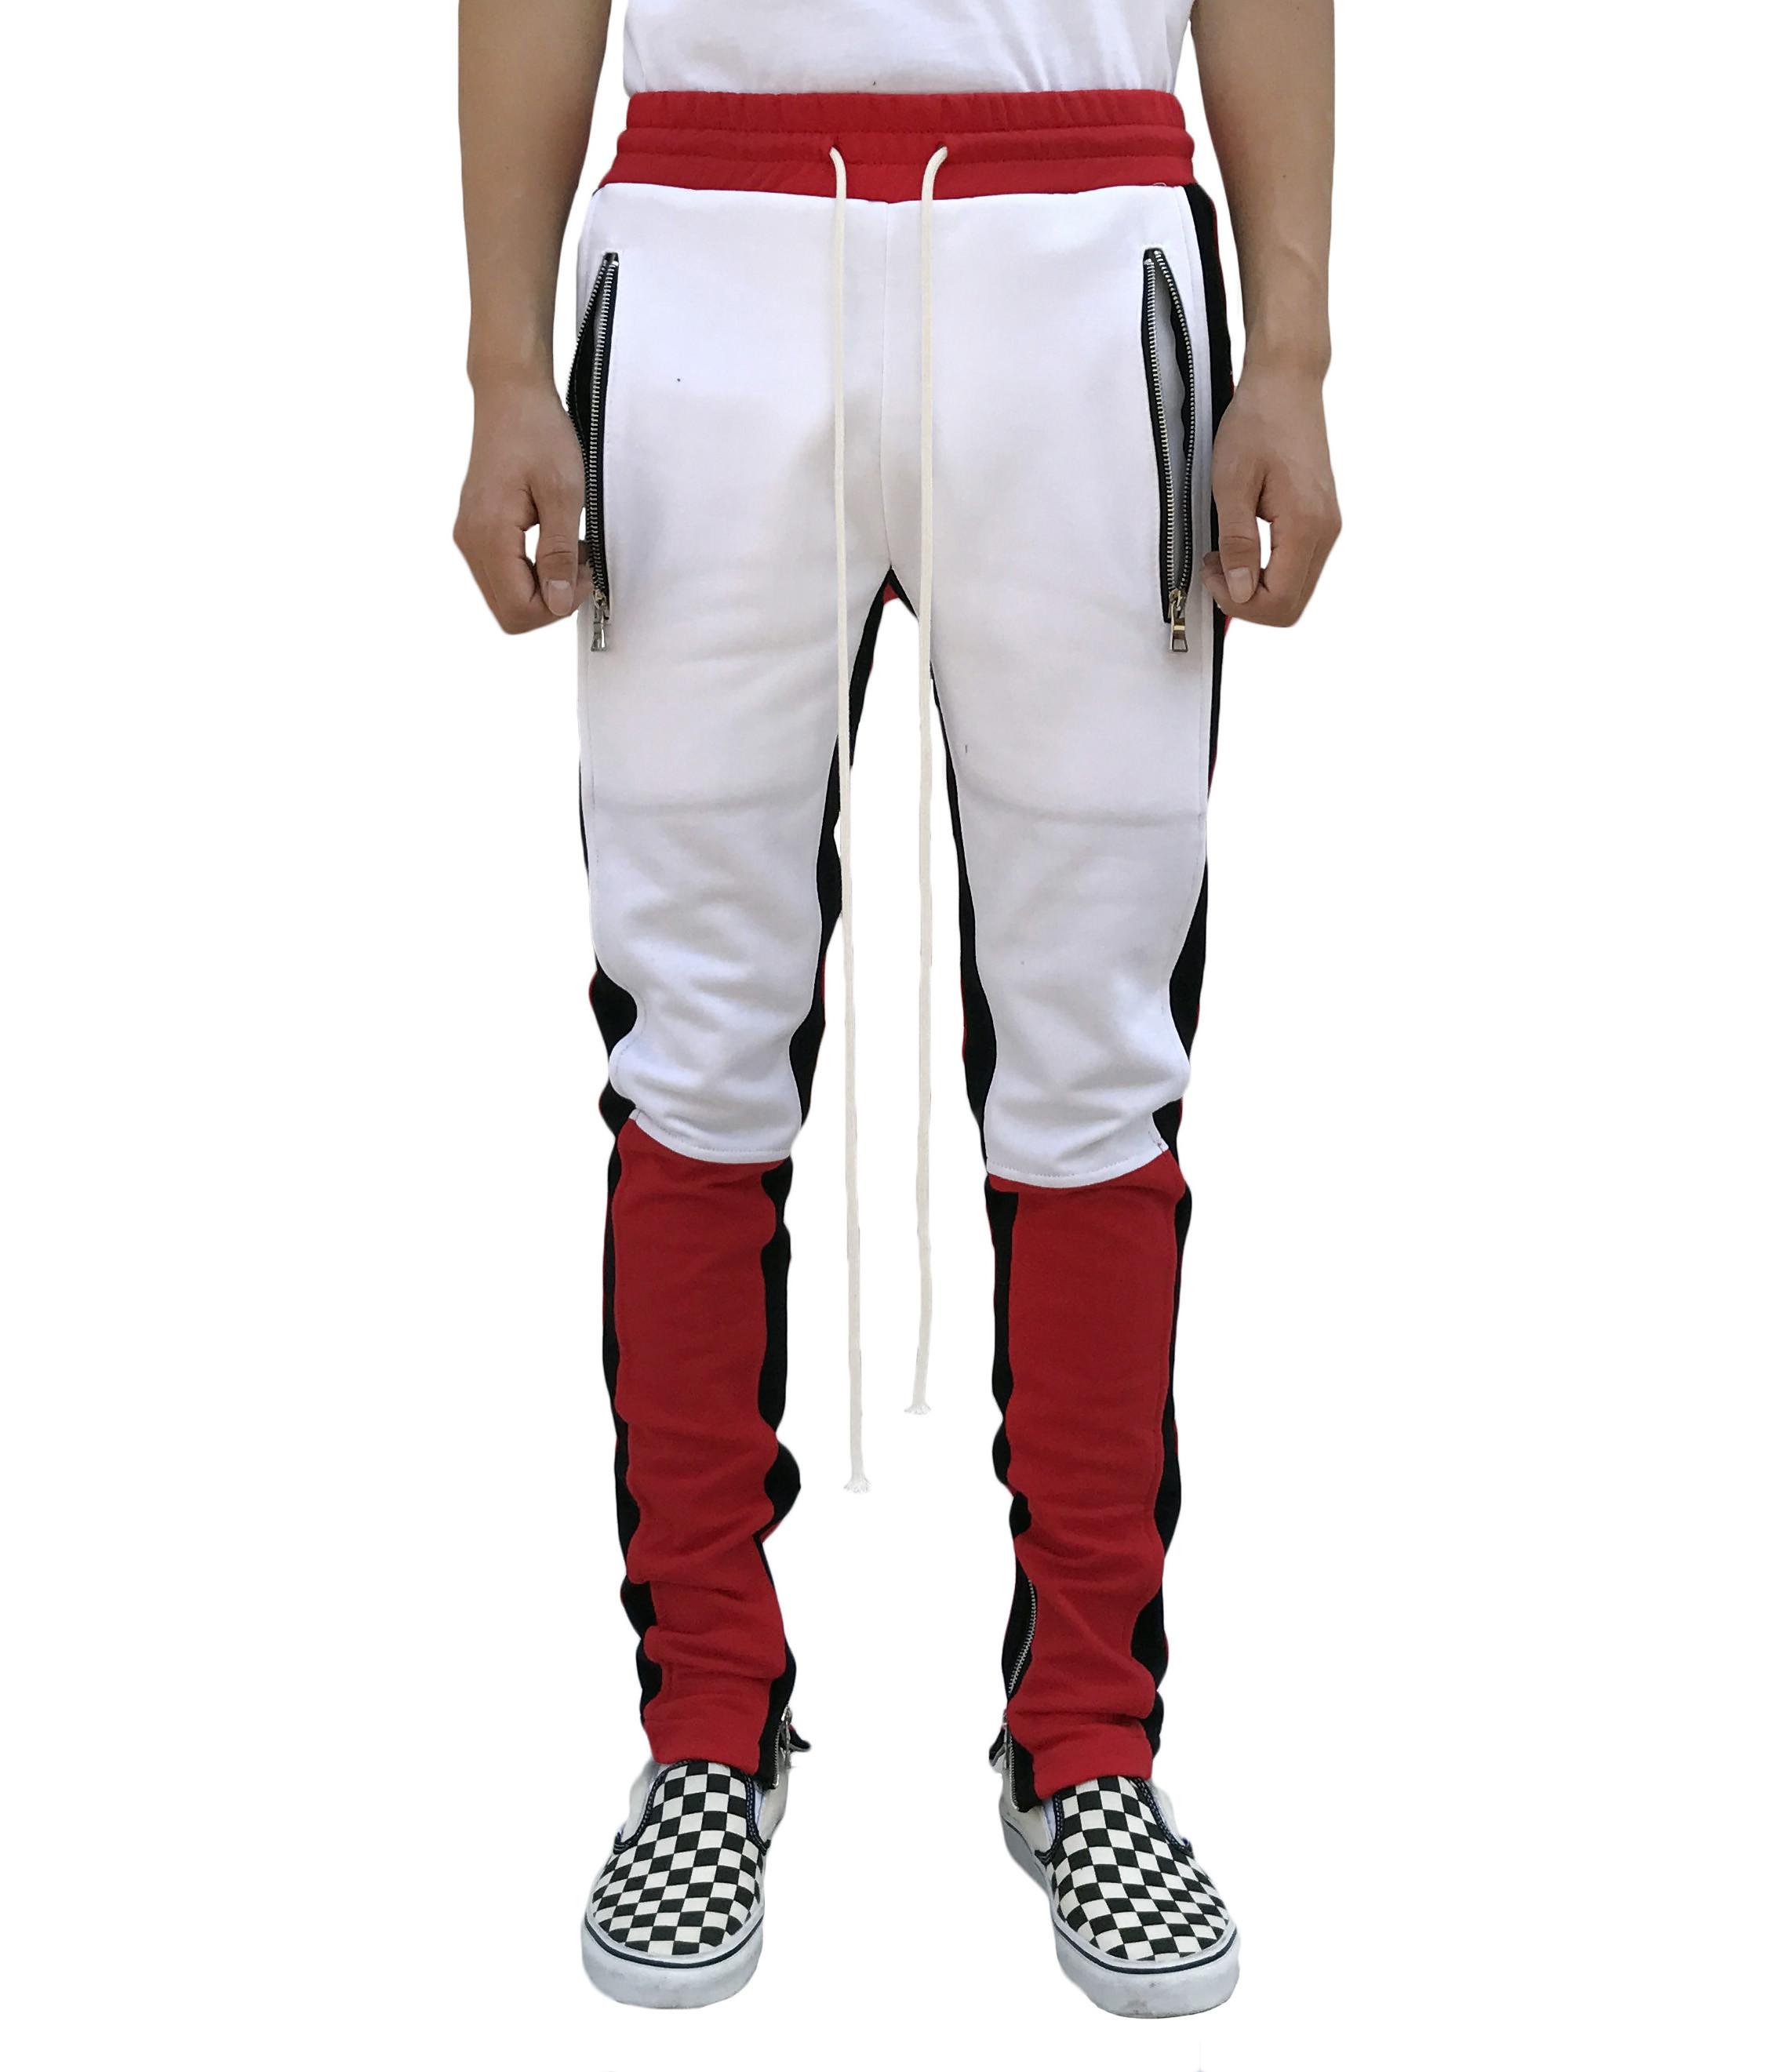 Motocross Track Pant -Red/White